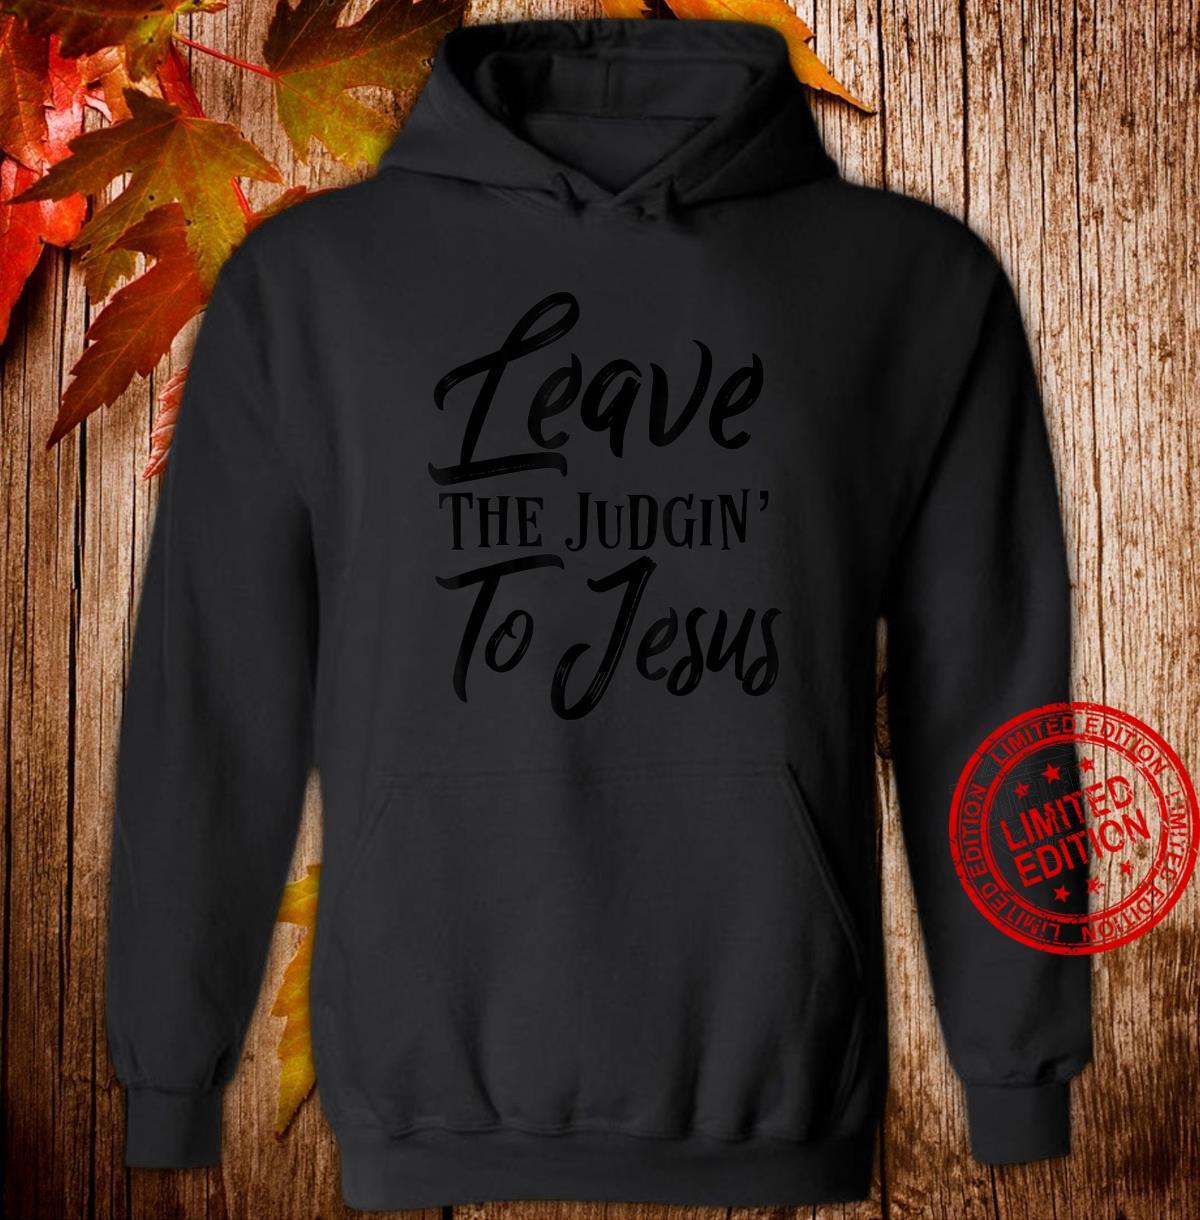 Leave The Judgin To Jesus Faith Based Christian Shirt hoodie